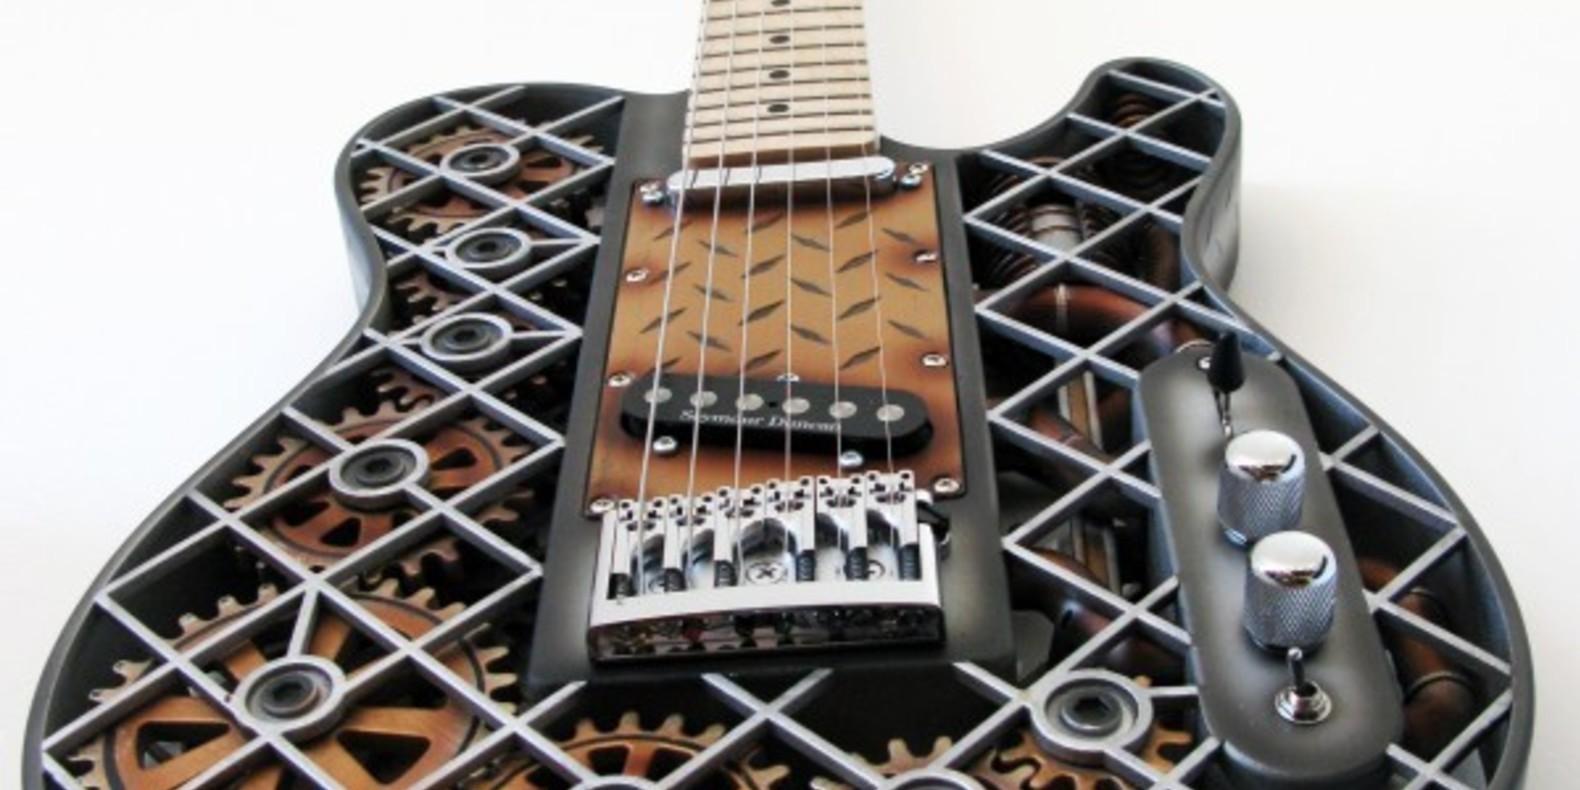 steampunk olaf diegel fichier 3D cults 3D printed printer guitare steampunk imprimée en 3D